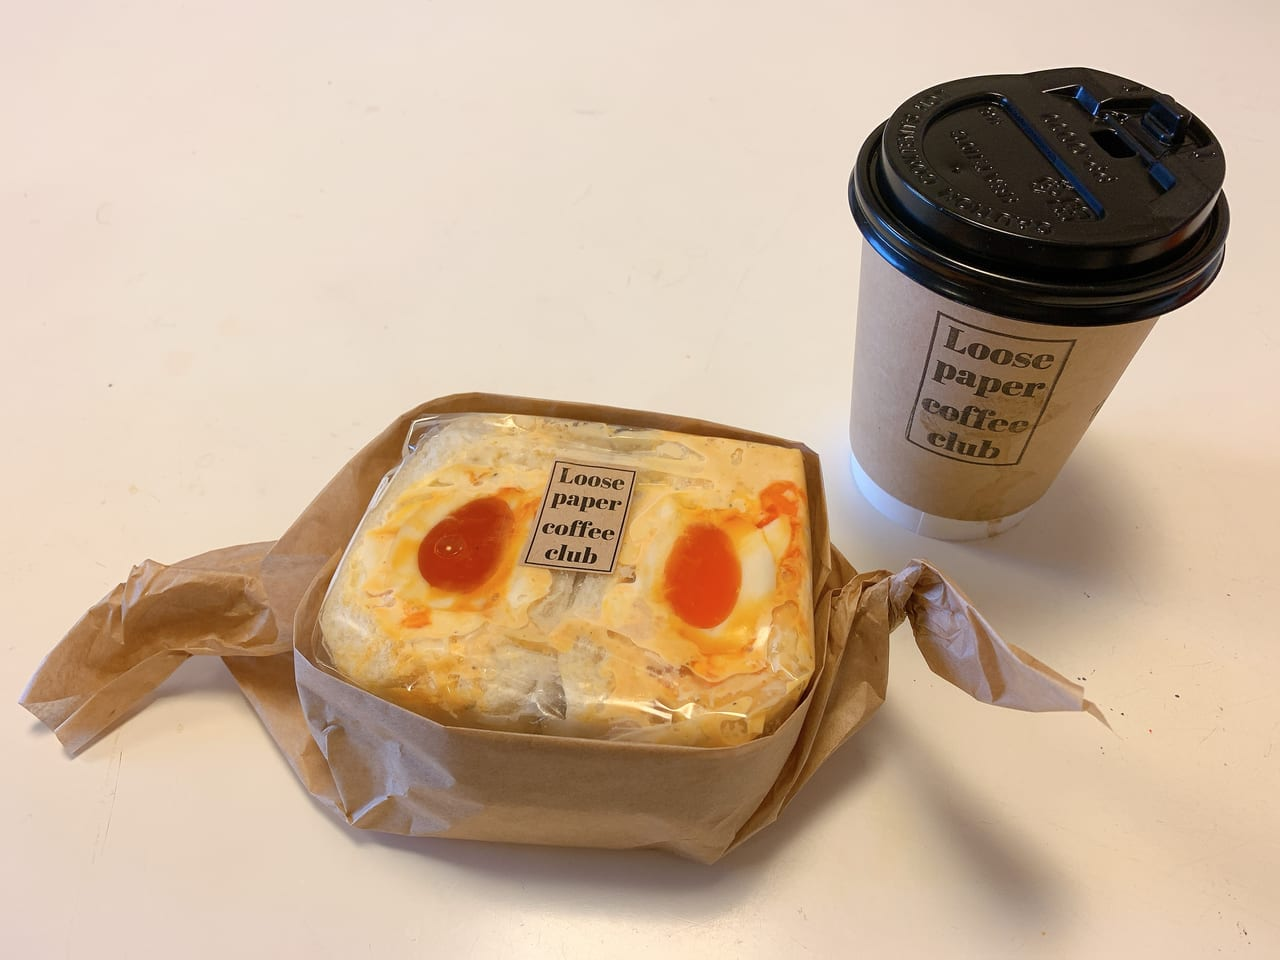 Loose Paper Cofee Club ほうじ茶ラテと卵サンド